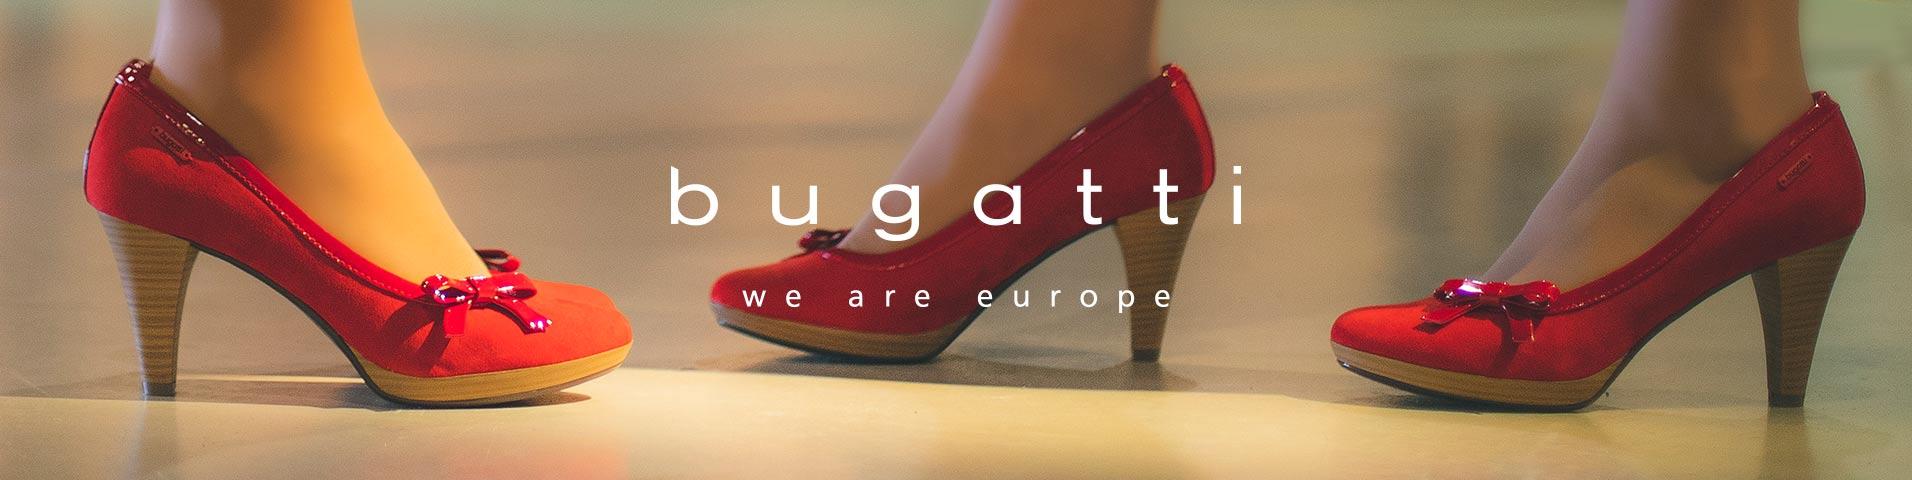 Bugatti Damesschoenen online kopen | Gratis verzending | ZALANDO